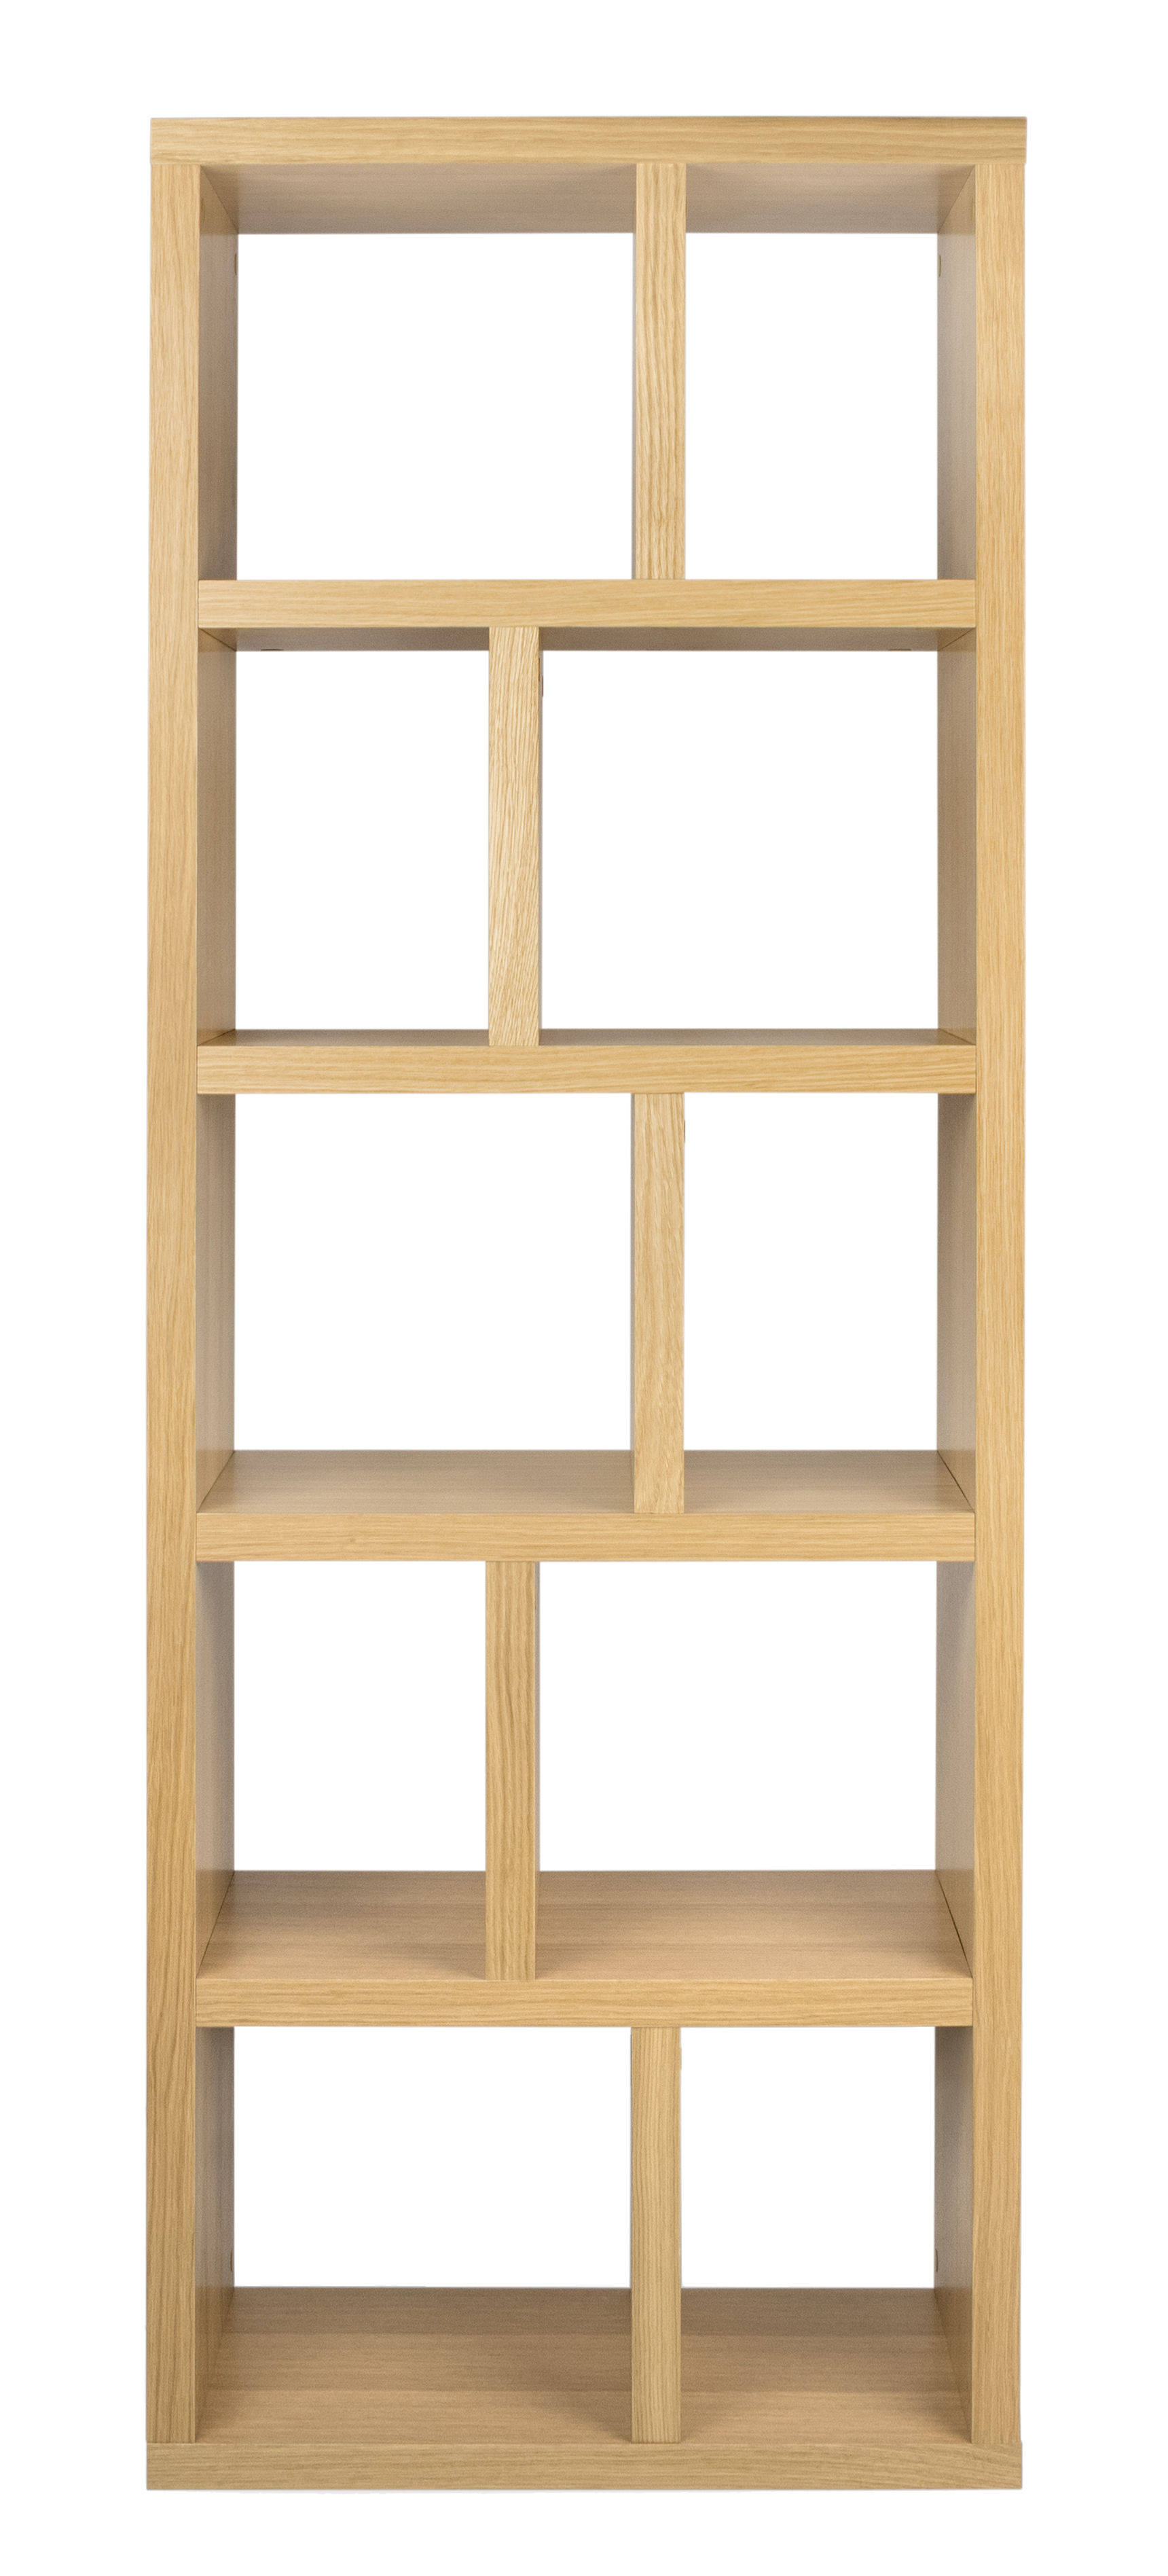 Furniture - Bookcases & Bookshelves - Rotterdam Bookcase - / L 70 x H 198 cm by POP UP HOME - Oak - Oak veneered honeycomb panels